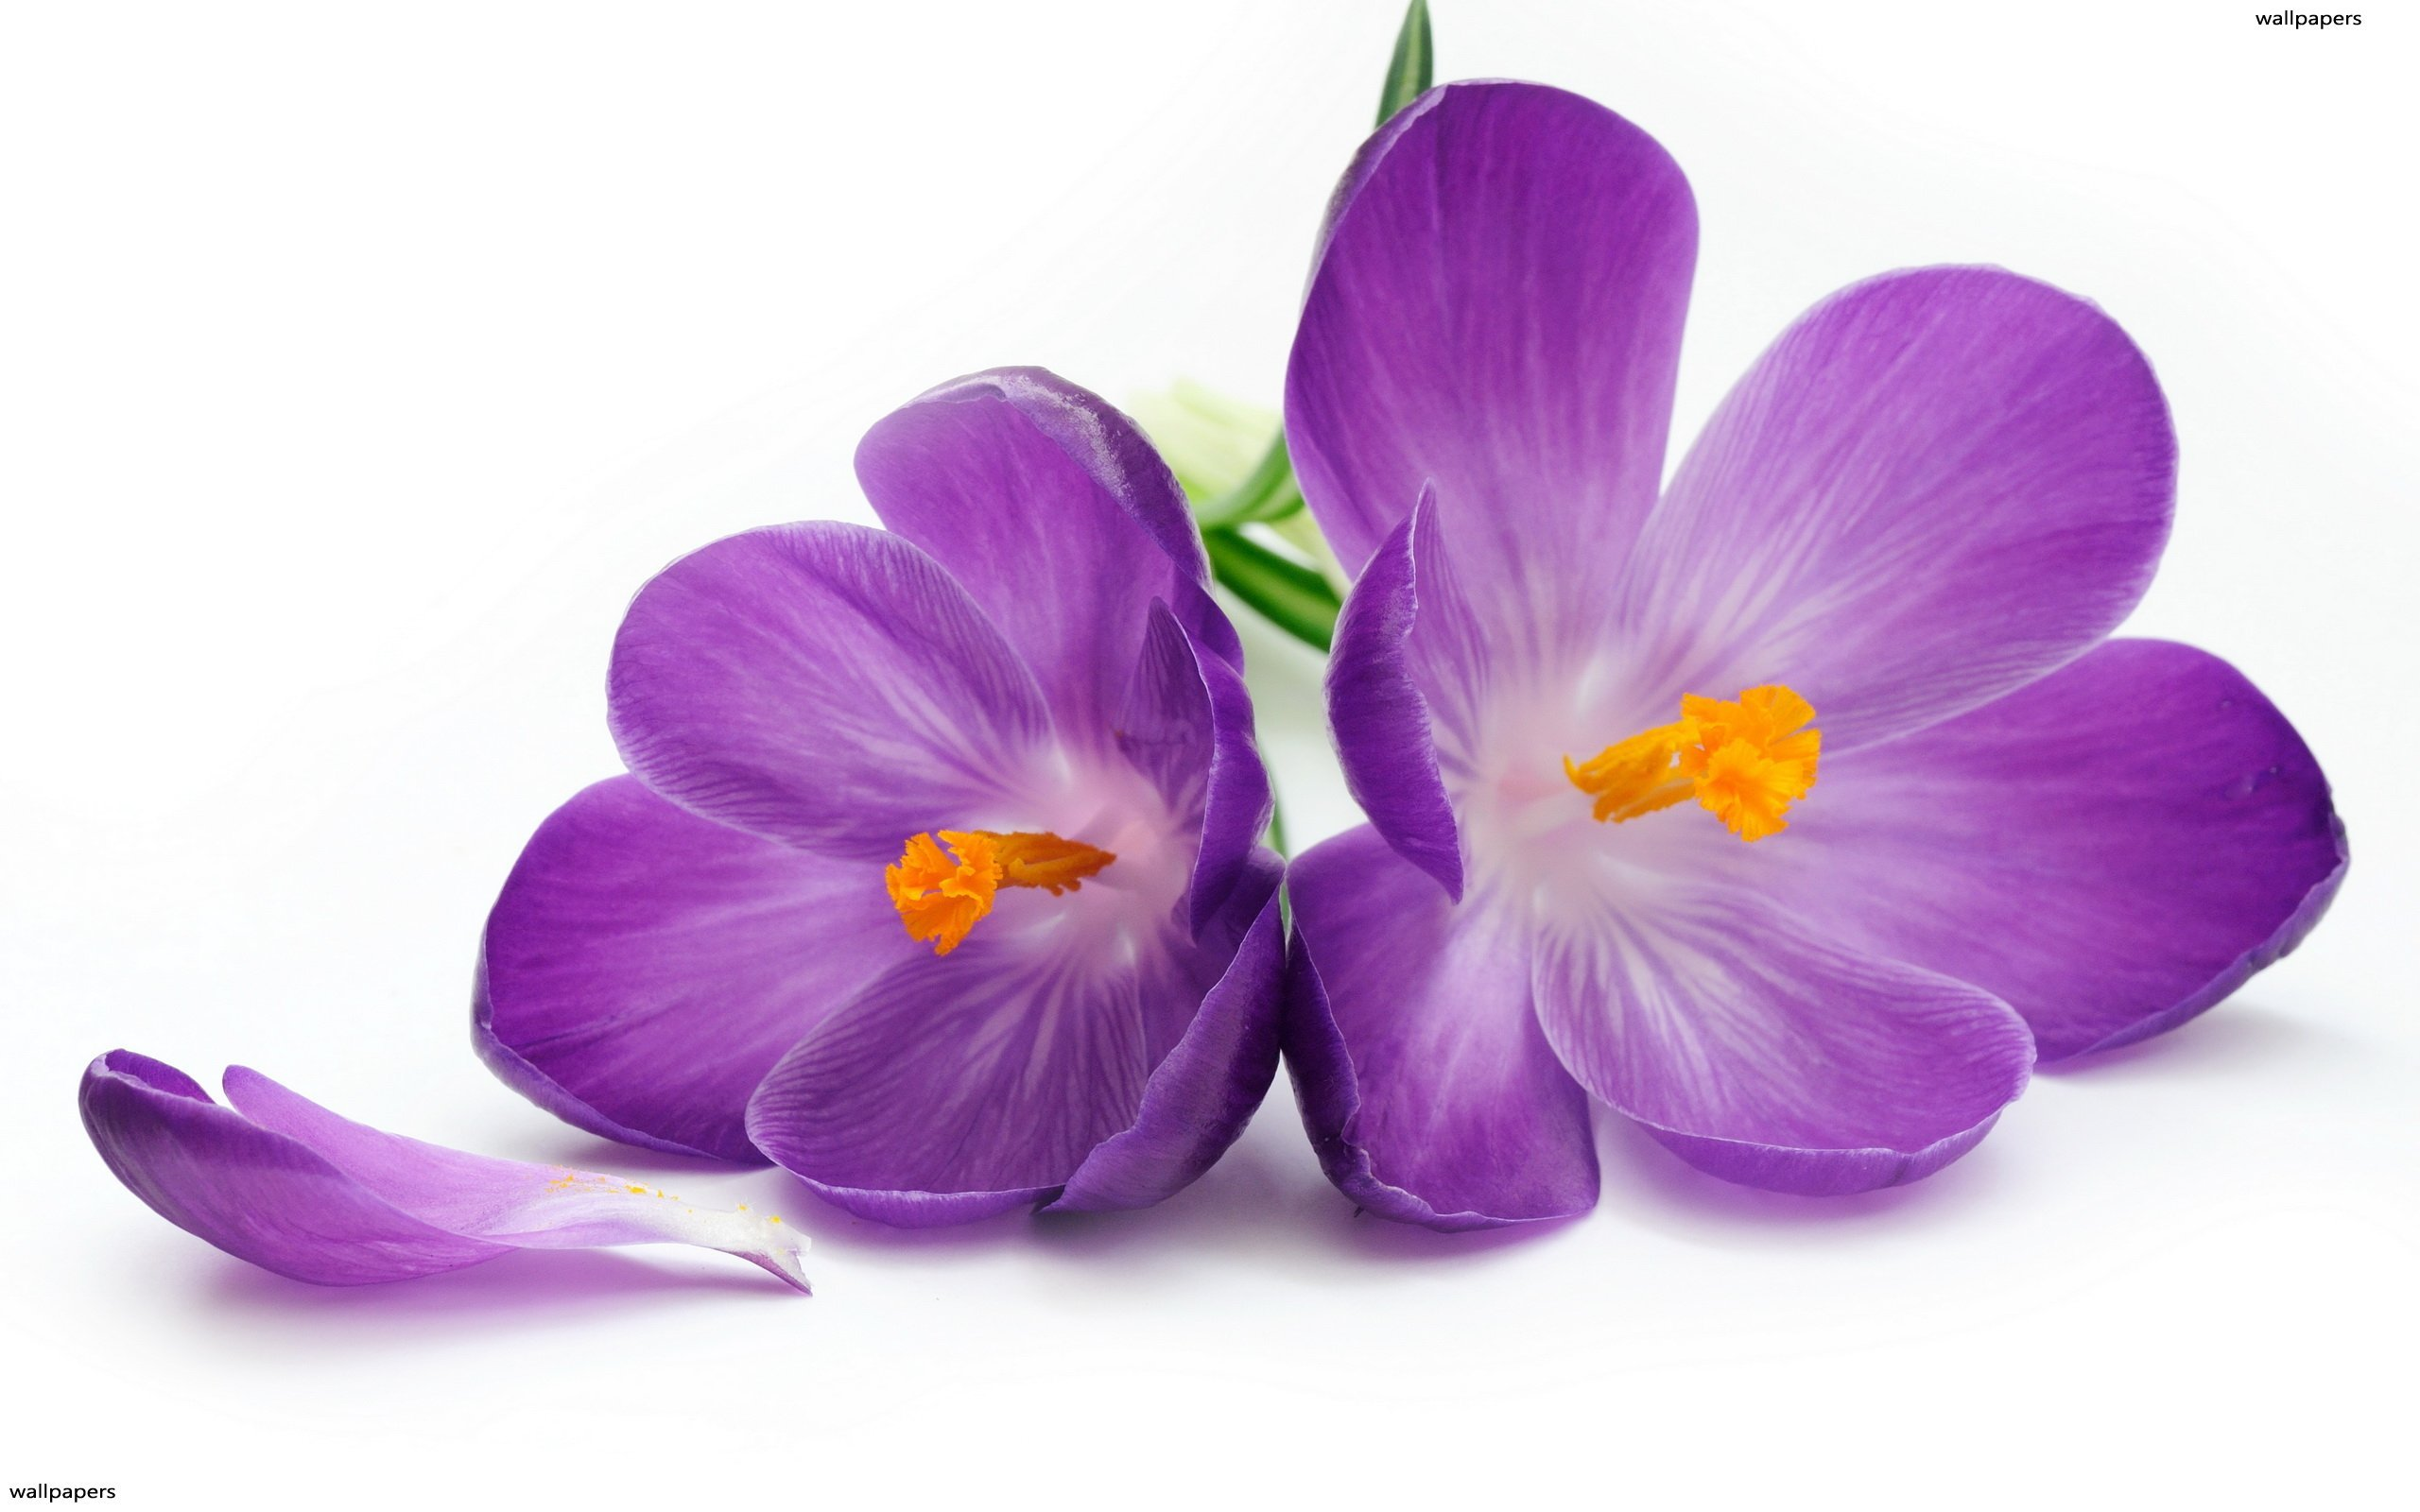 D'Olivo Violet Balsamic Vinegar 233